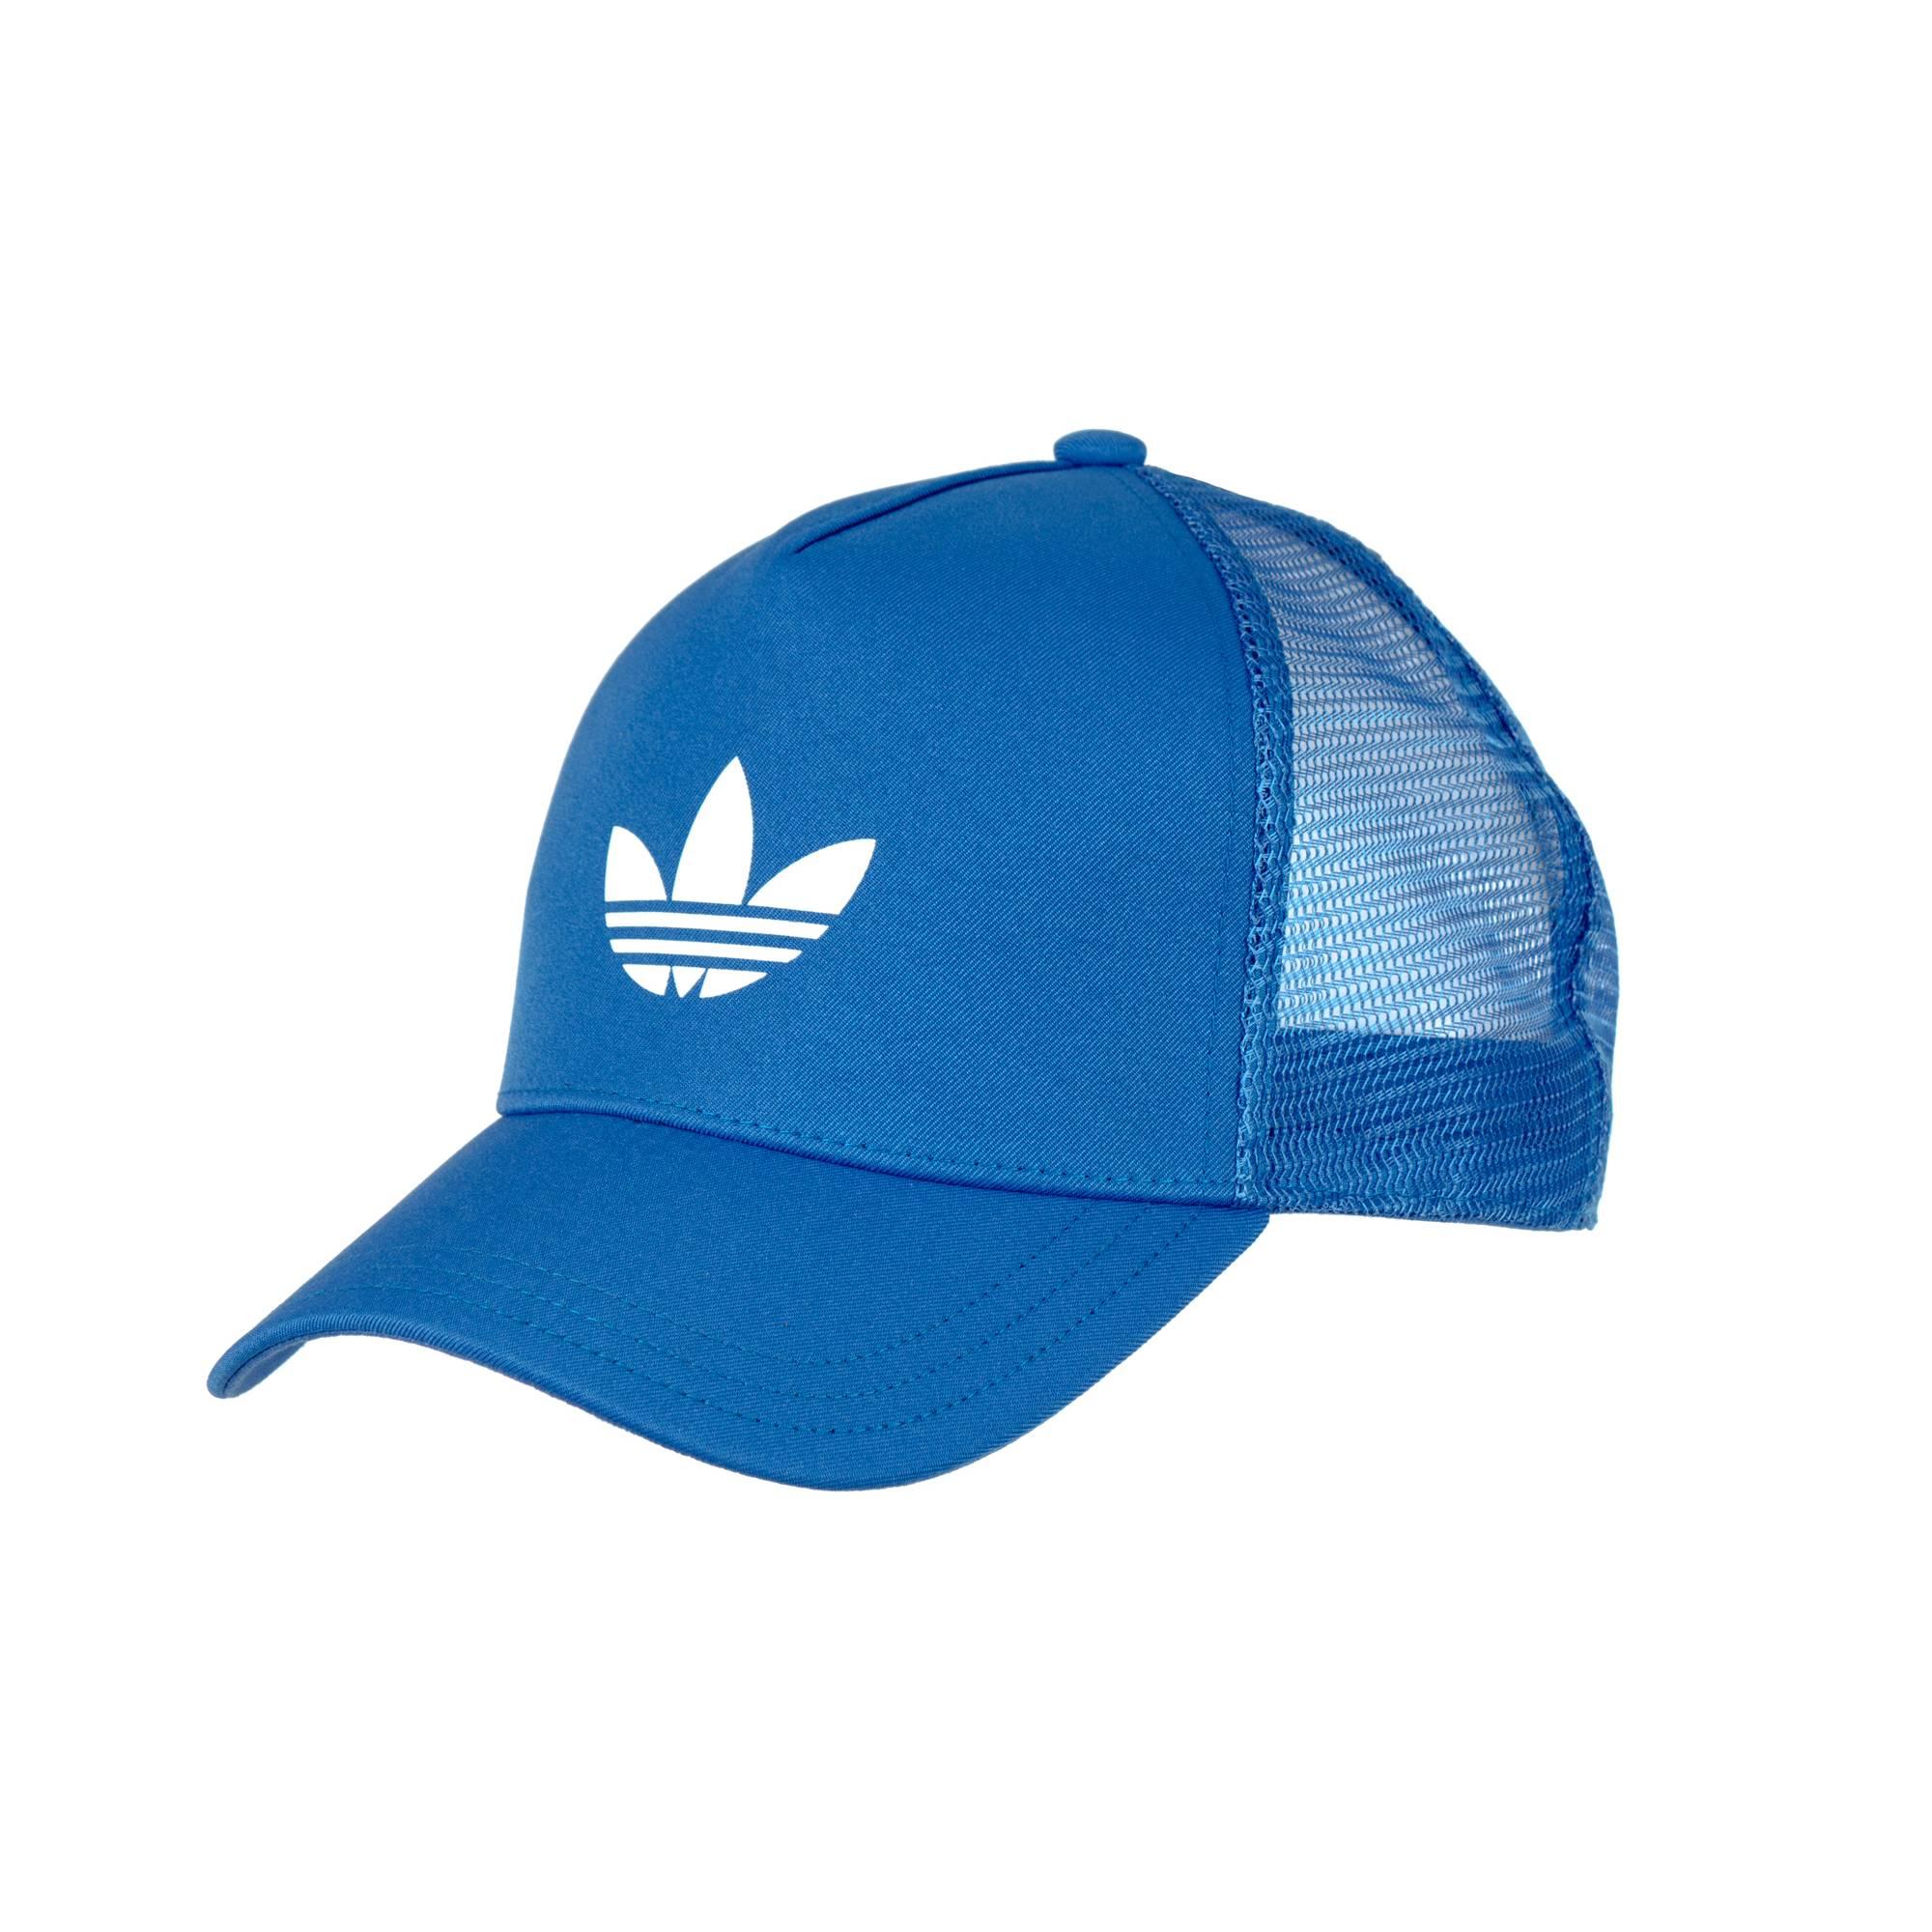 5bec2bfeb26 gorra azul adidas